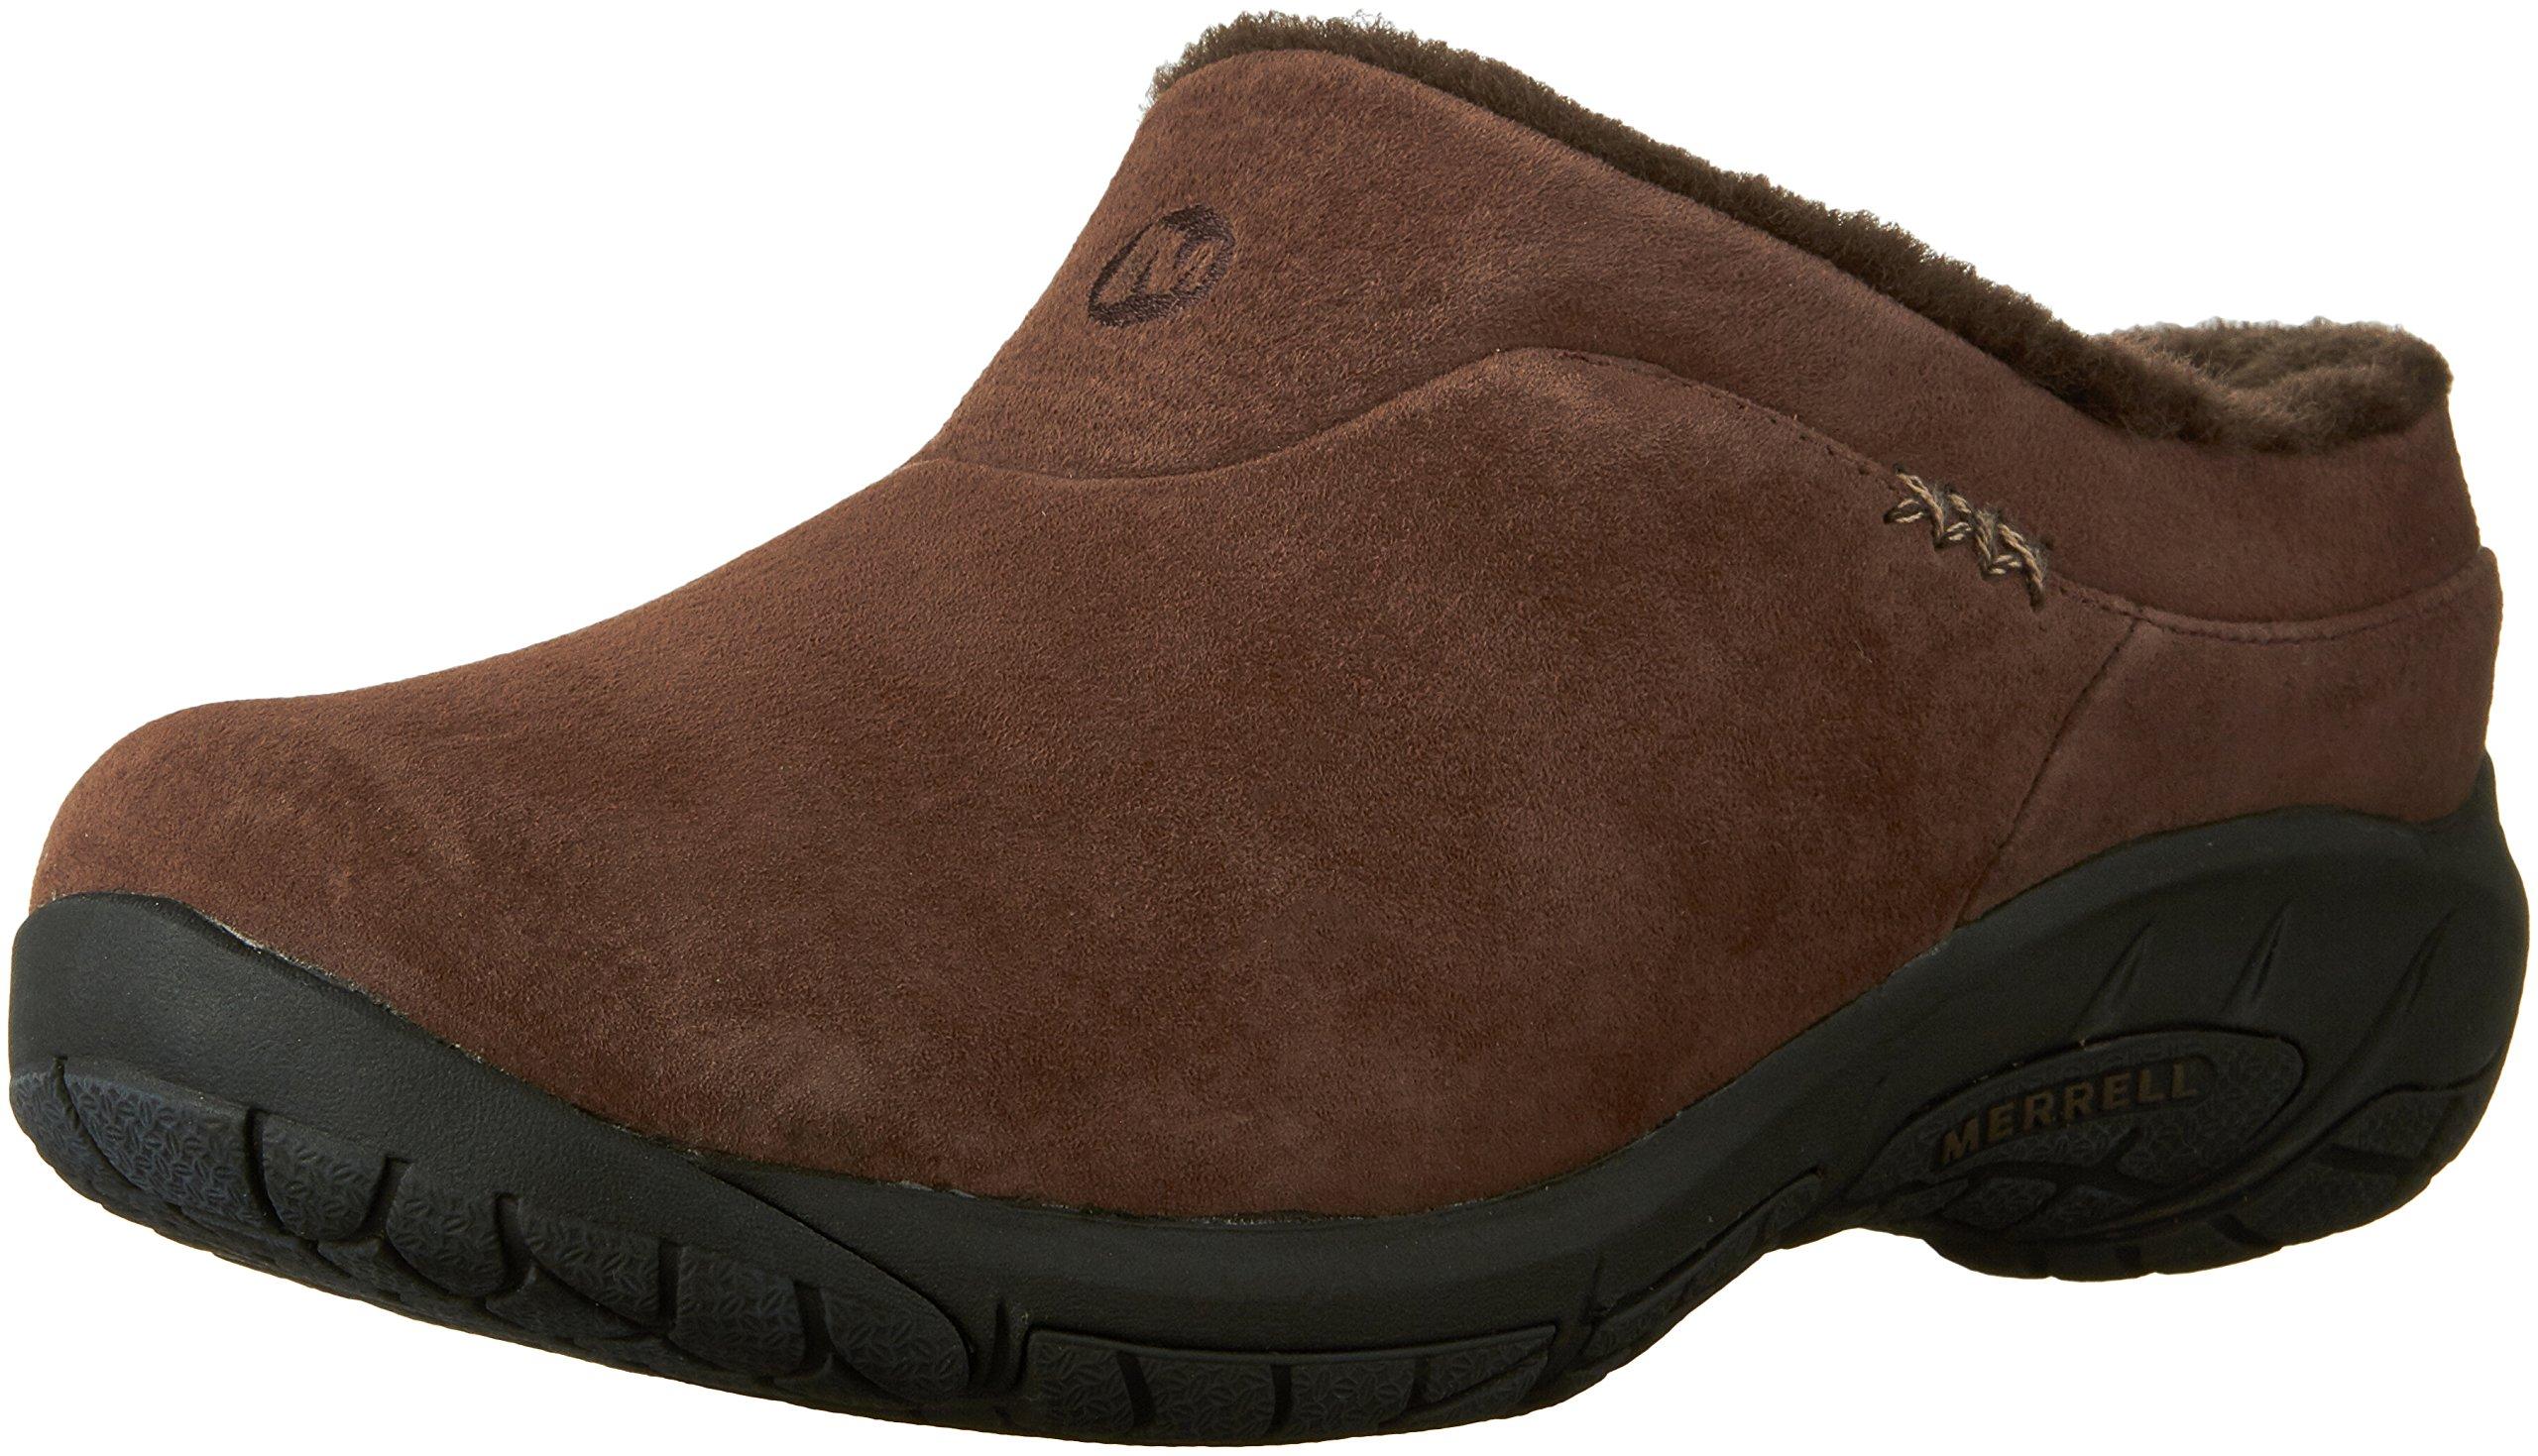 Merrell Women's Encore Ice Slip-On Shoe, Chocolate Brown, 6 M US